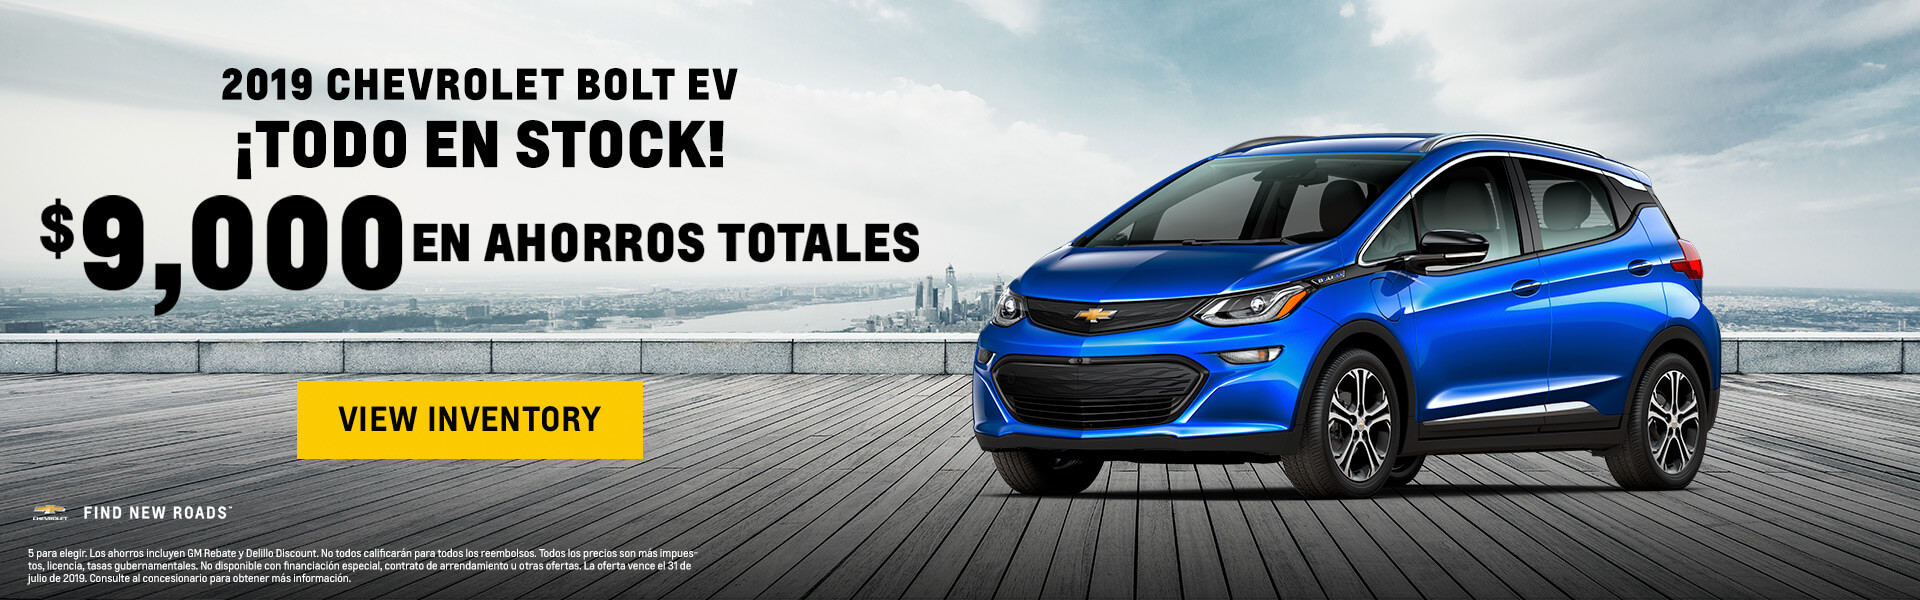 Chevy Bolt EV $9000 Savings